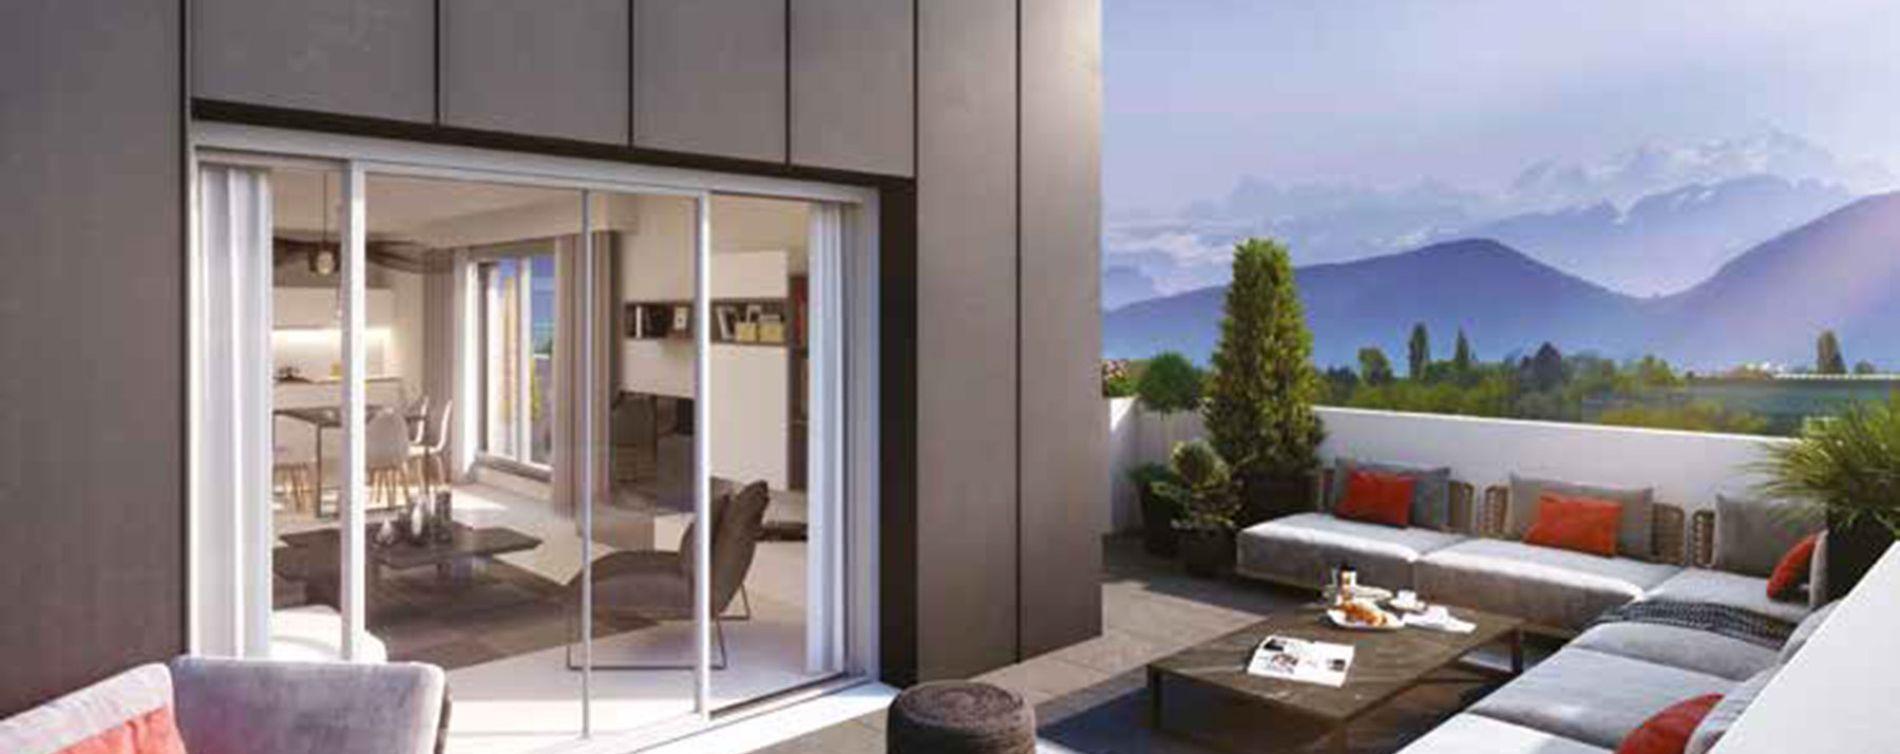 Saint-Genis-Pouilly : programme immobilier neuve « Atôm » (2)